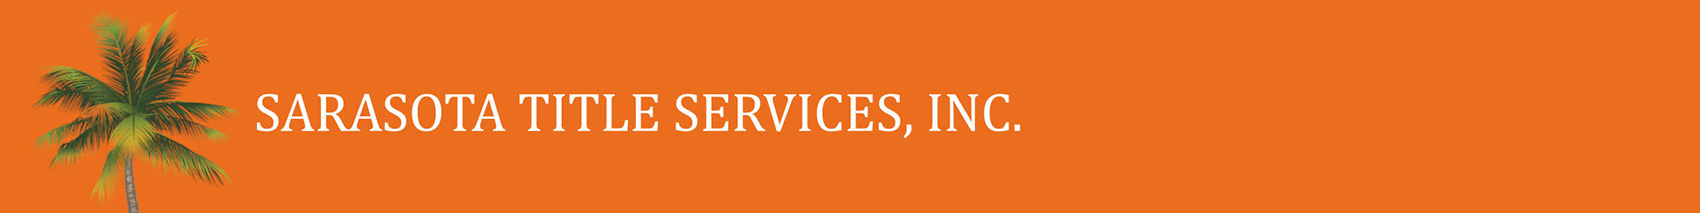 Sarasota Title Services, Inc.